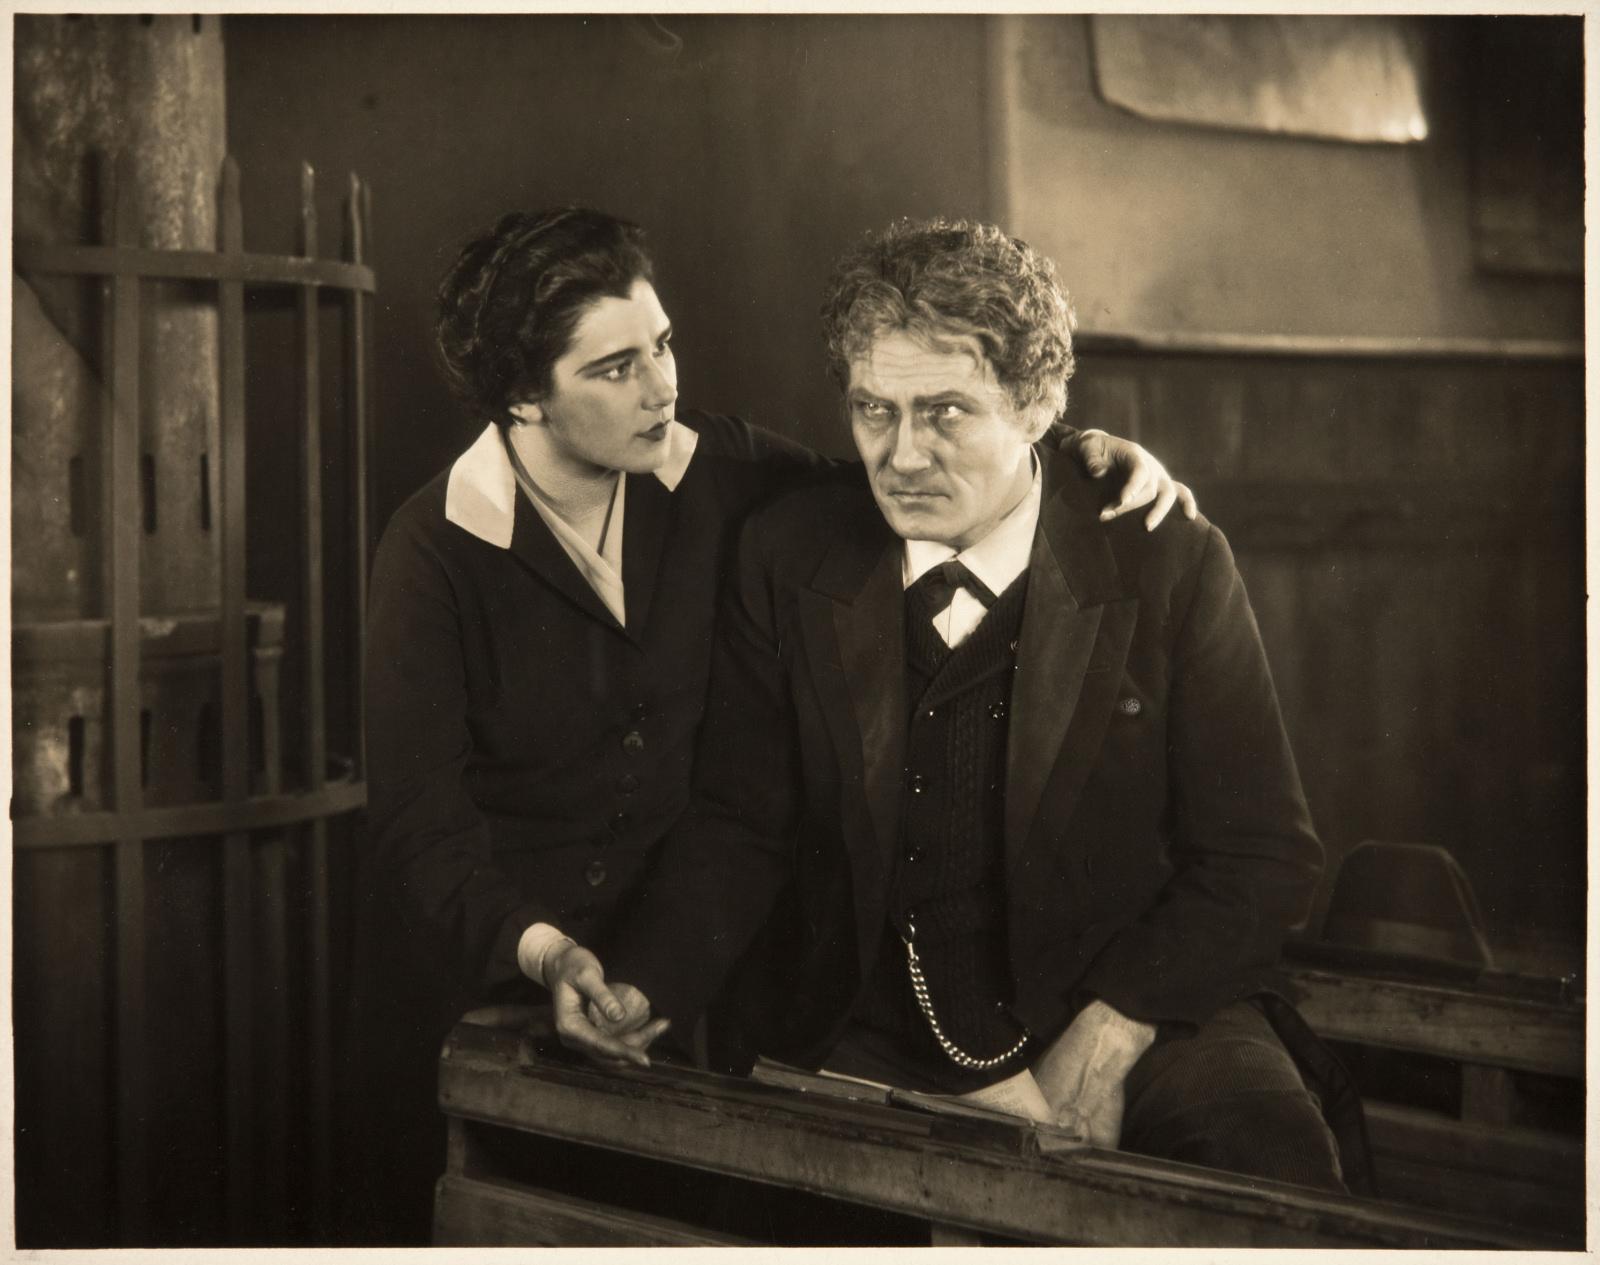 Nita Naldi and Bernhard Goetzke in The Mountain Eagle (1926, dir. Alfred Hitchcock)